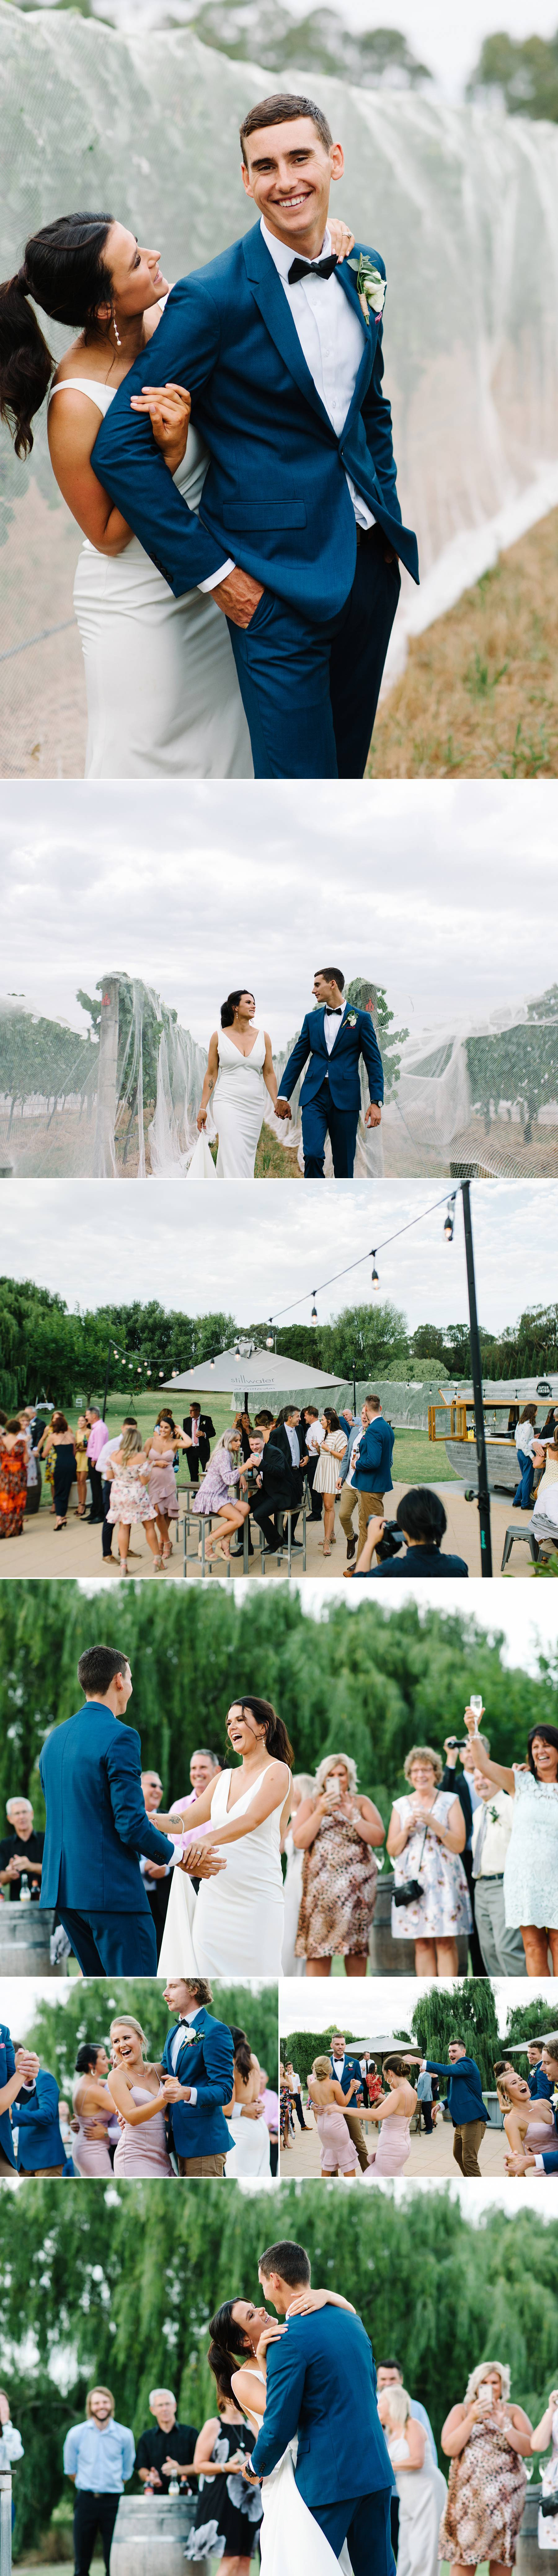 Mornington Peninsula wedding reception photography by Michelle Pragt